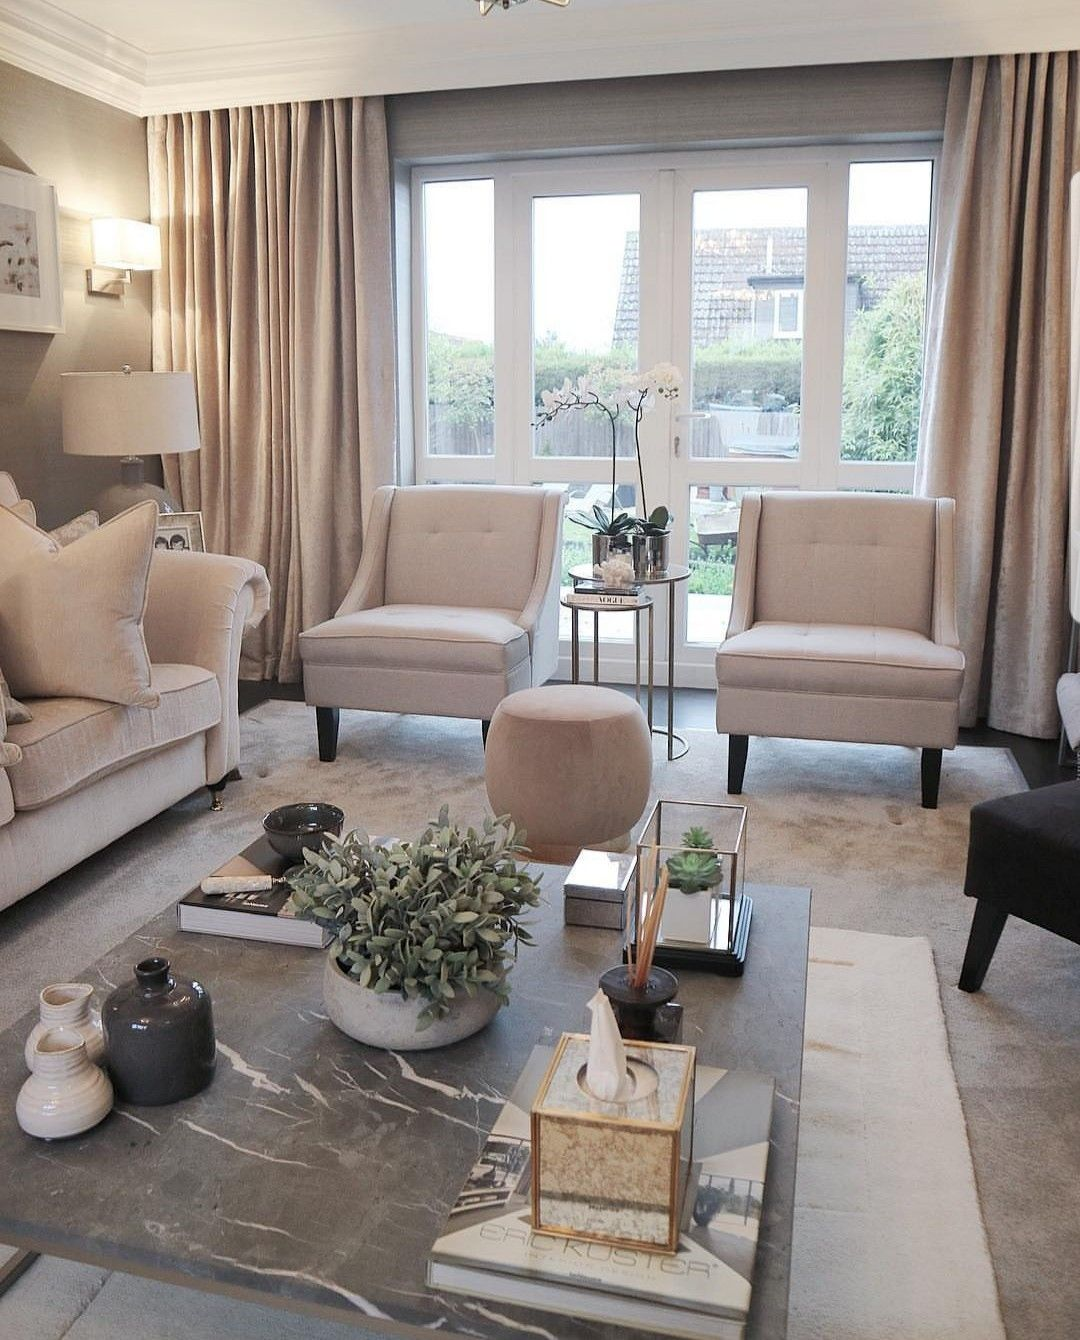 Pin By Hayla On Interior Design Small Living Room Decor Elegant